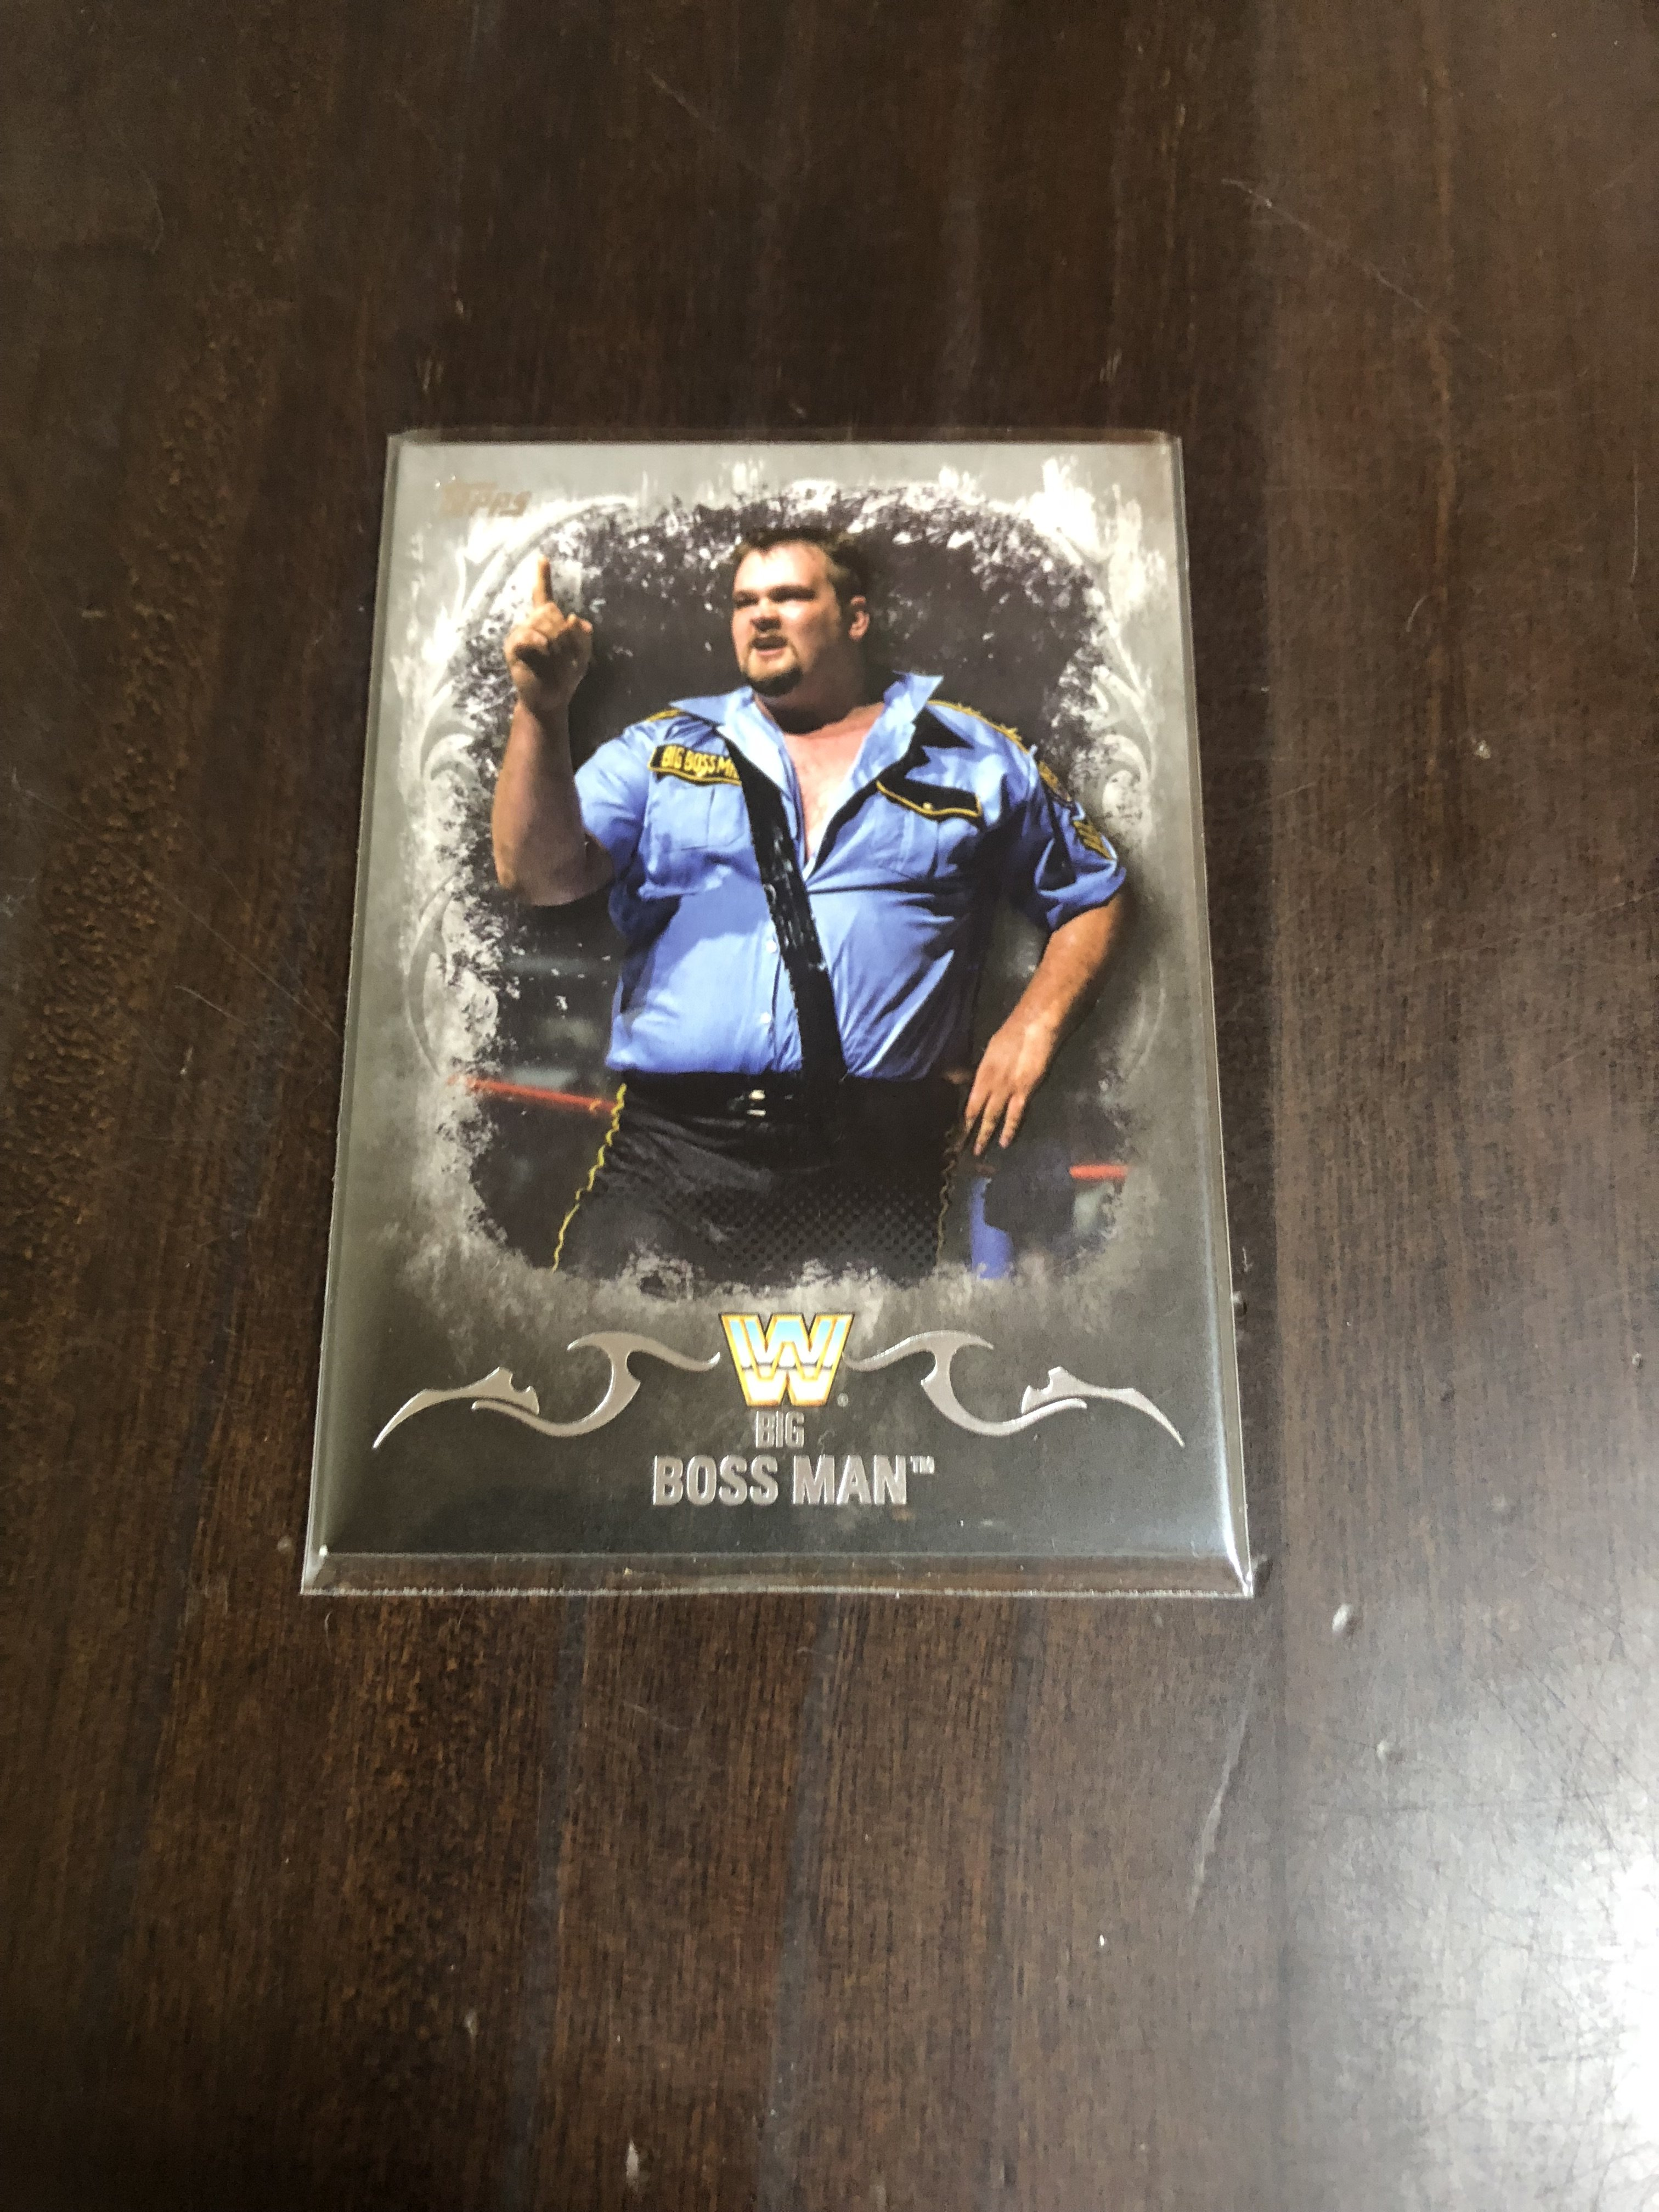 BIG BOSS MAN WWE  職業摔角選手卡  限34/50